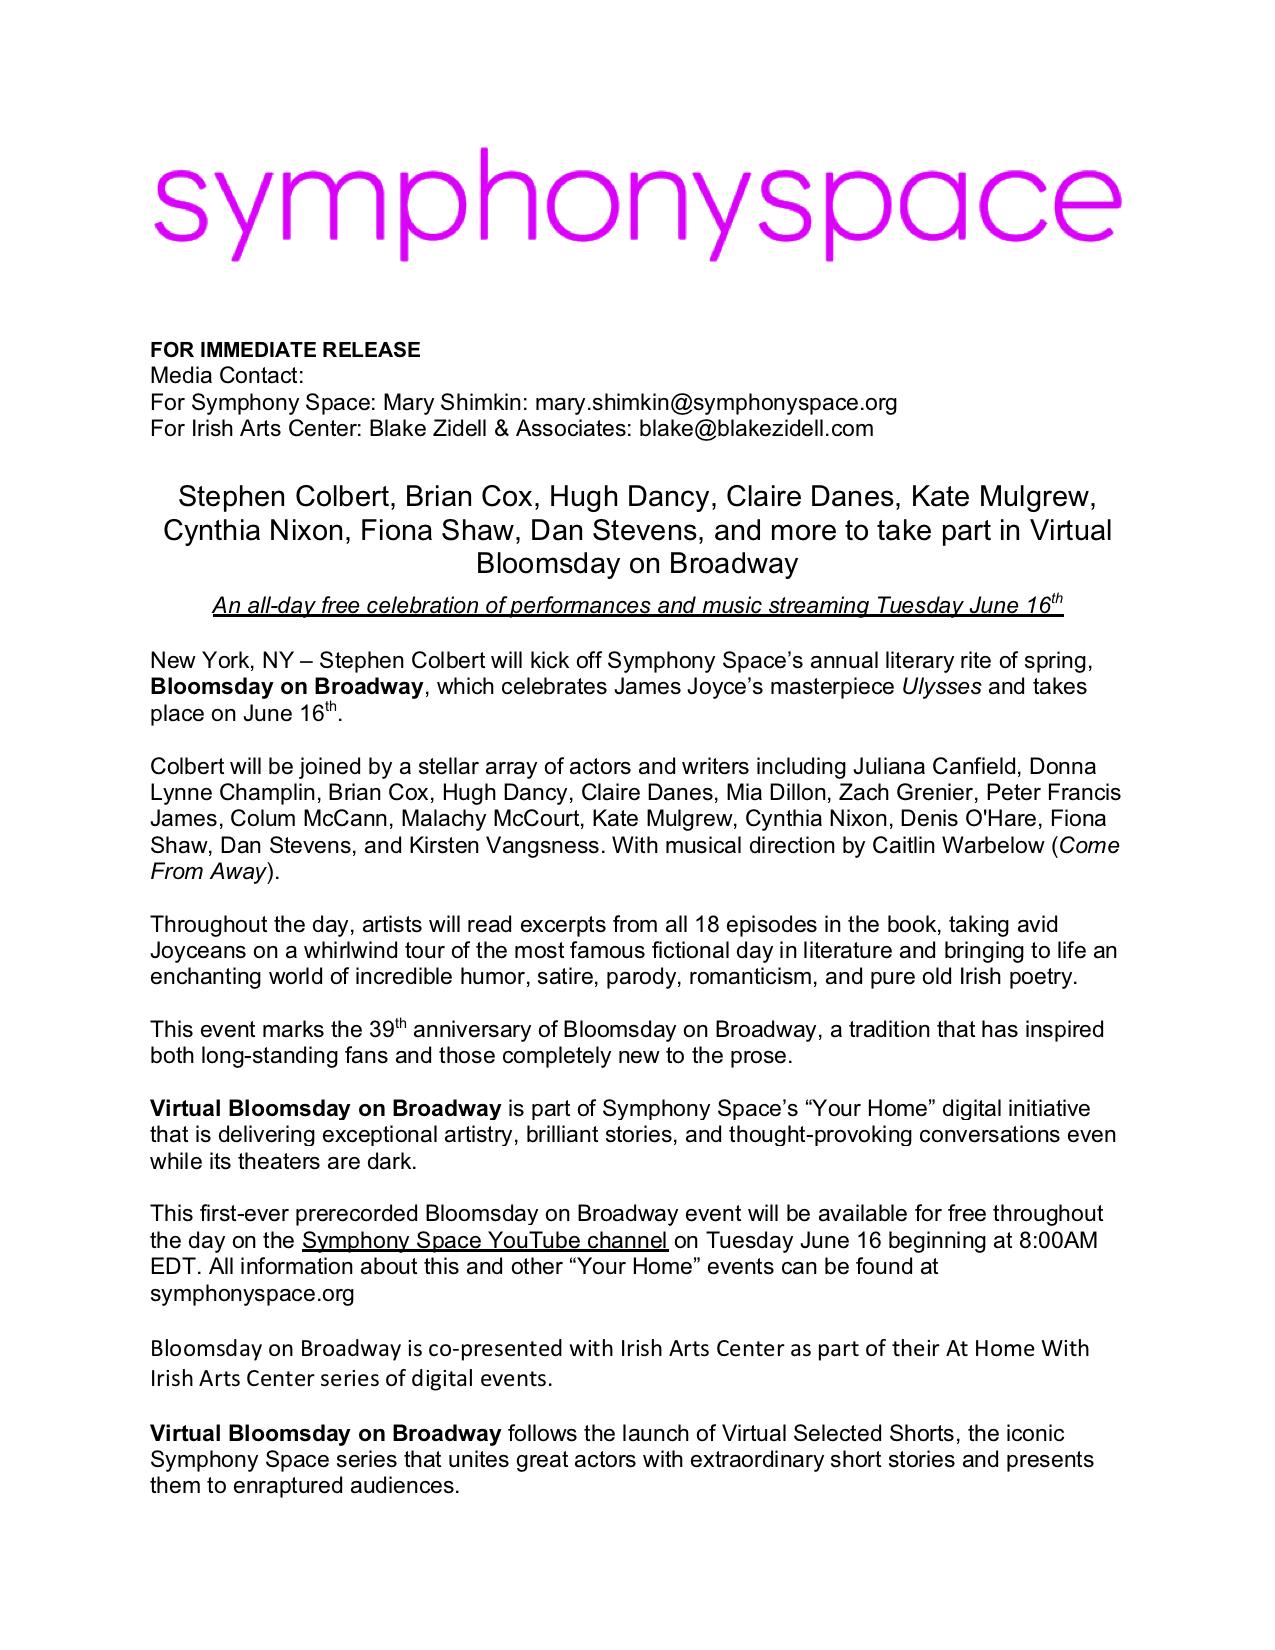 @SymphonySpace's #BloomsdayOnBroadway goes virtual! Readers: @L8ShowColbert @ClaireDanesnl @colummccann1 @FionaShawIGBE #KateMulgrew #BrianCox #HughDancy... #Ulysses excerpts selected by @JoyceSocietyNY's own @jonnysemicolon. @JJ_Gazette @JamesJoyceCentr @JoyceTrieste @JoyceTower https://t.co/KxGZUnC2jb